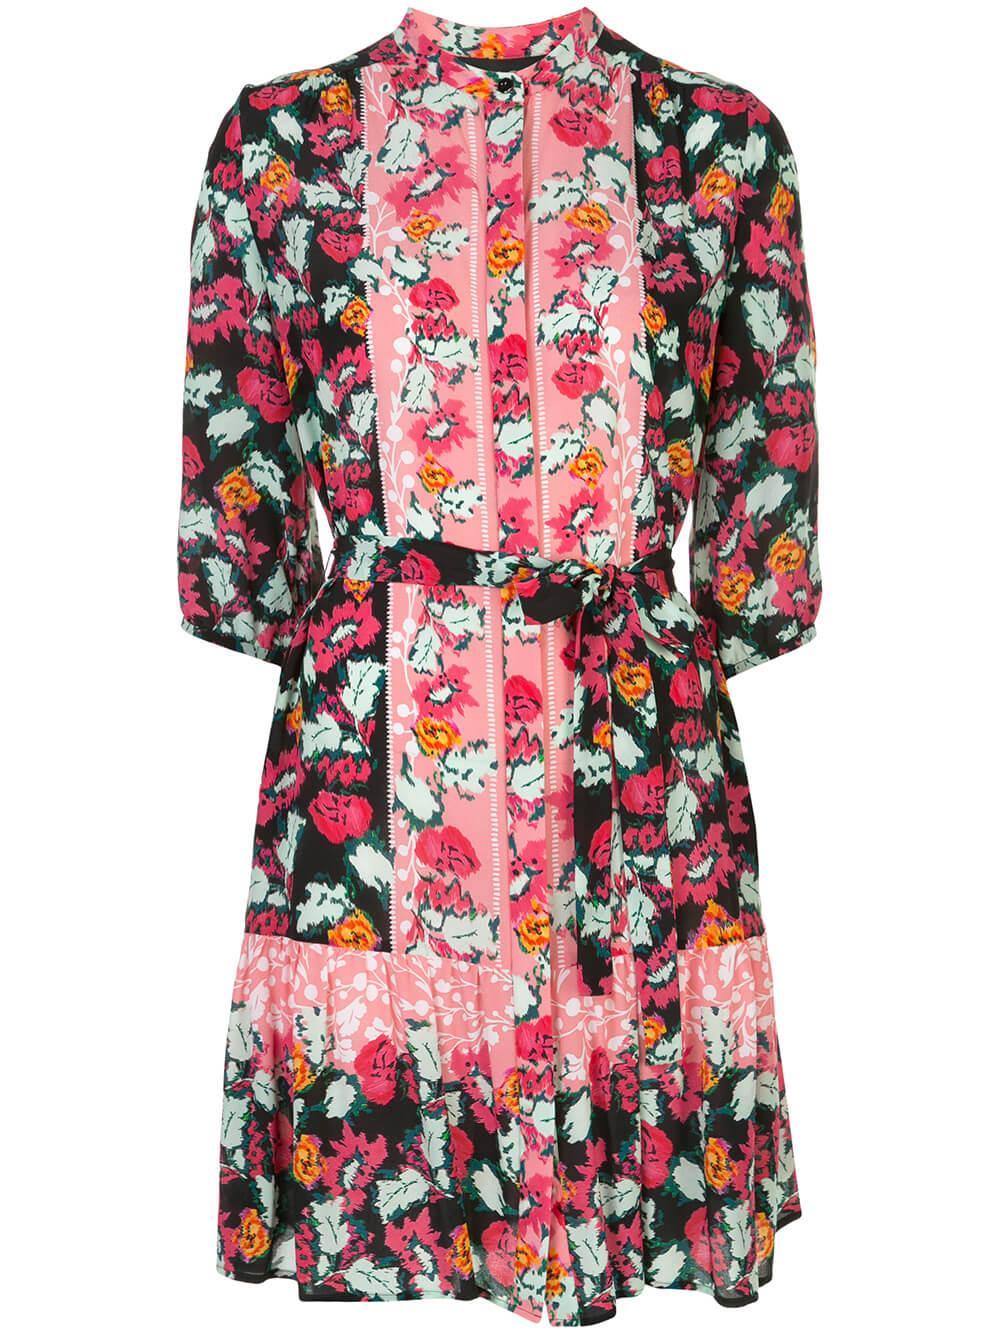 Tyra Floral Print Mini Dress